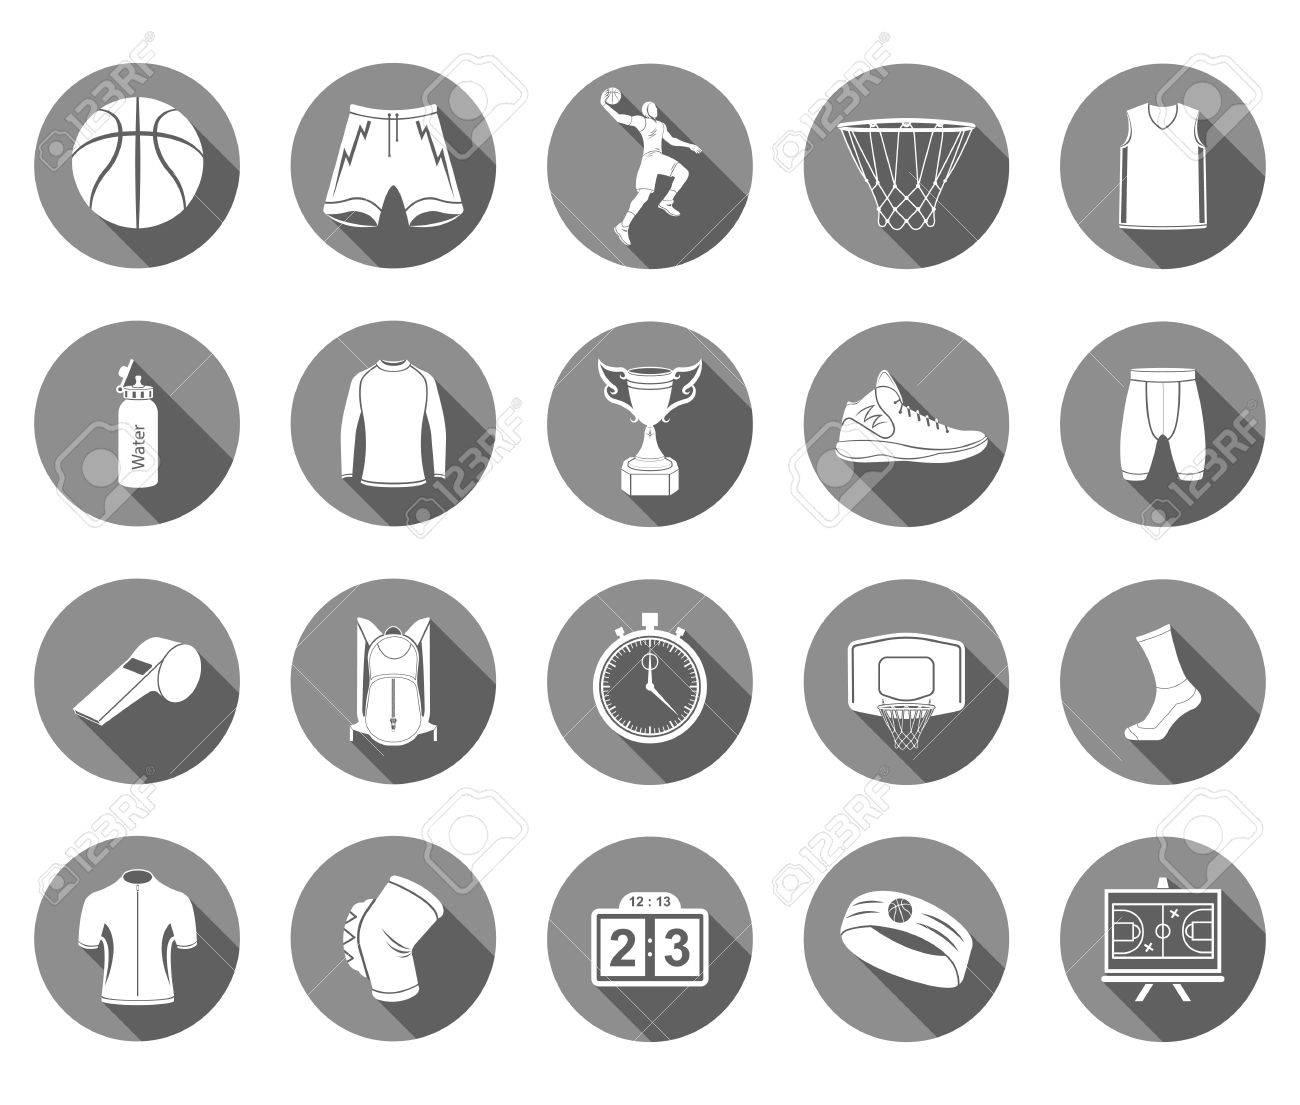 Basketball icon set stock vector large set of symbols icons basketball icon set stock vector large set of symbols icons of basketball buycottarizona